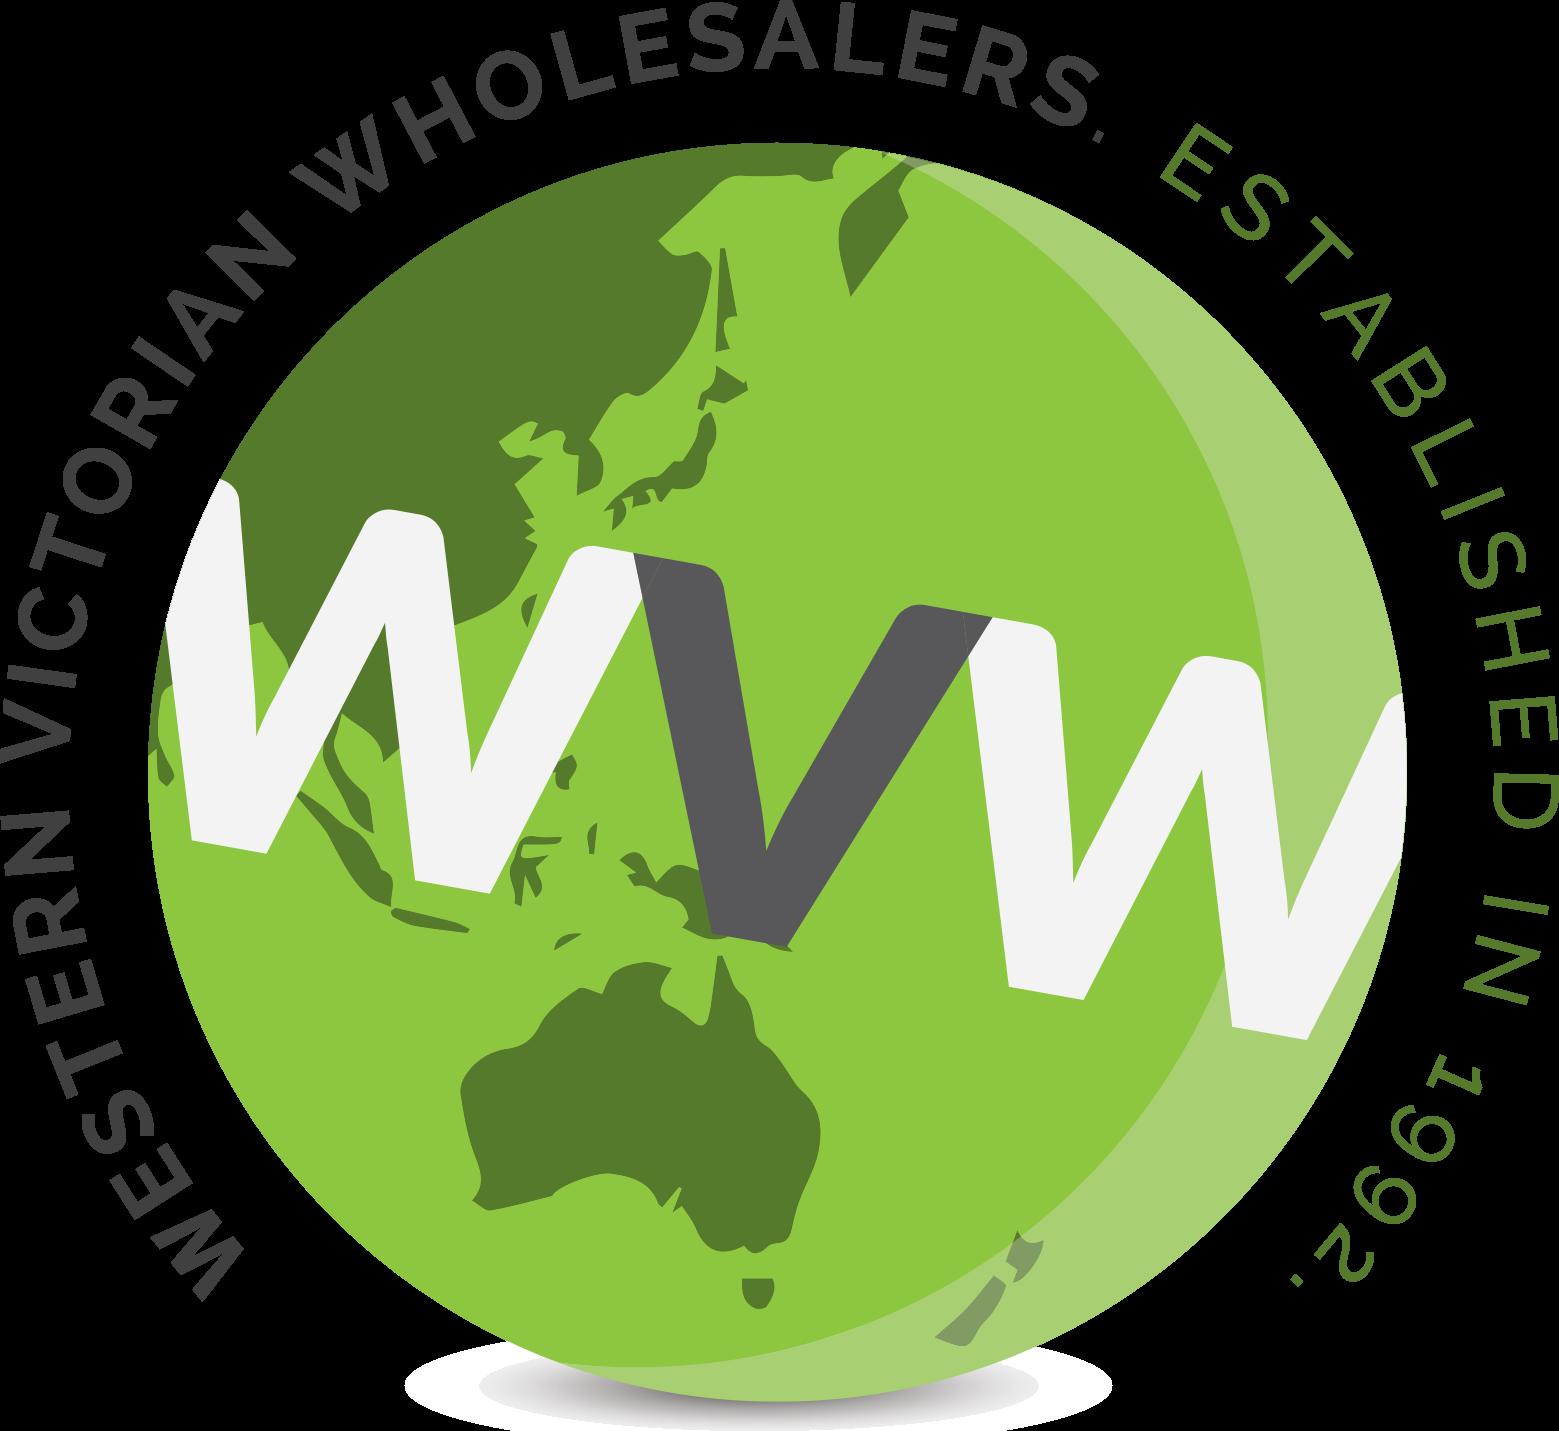 Western Victorian Wholesalers